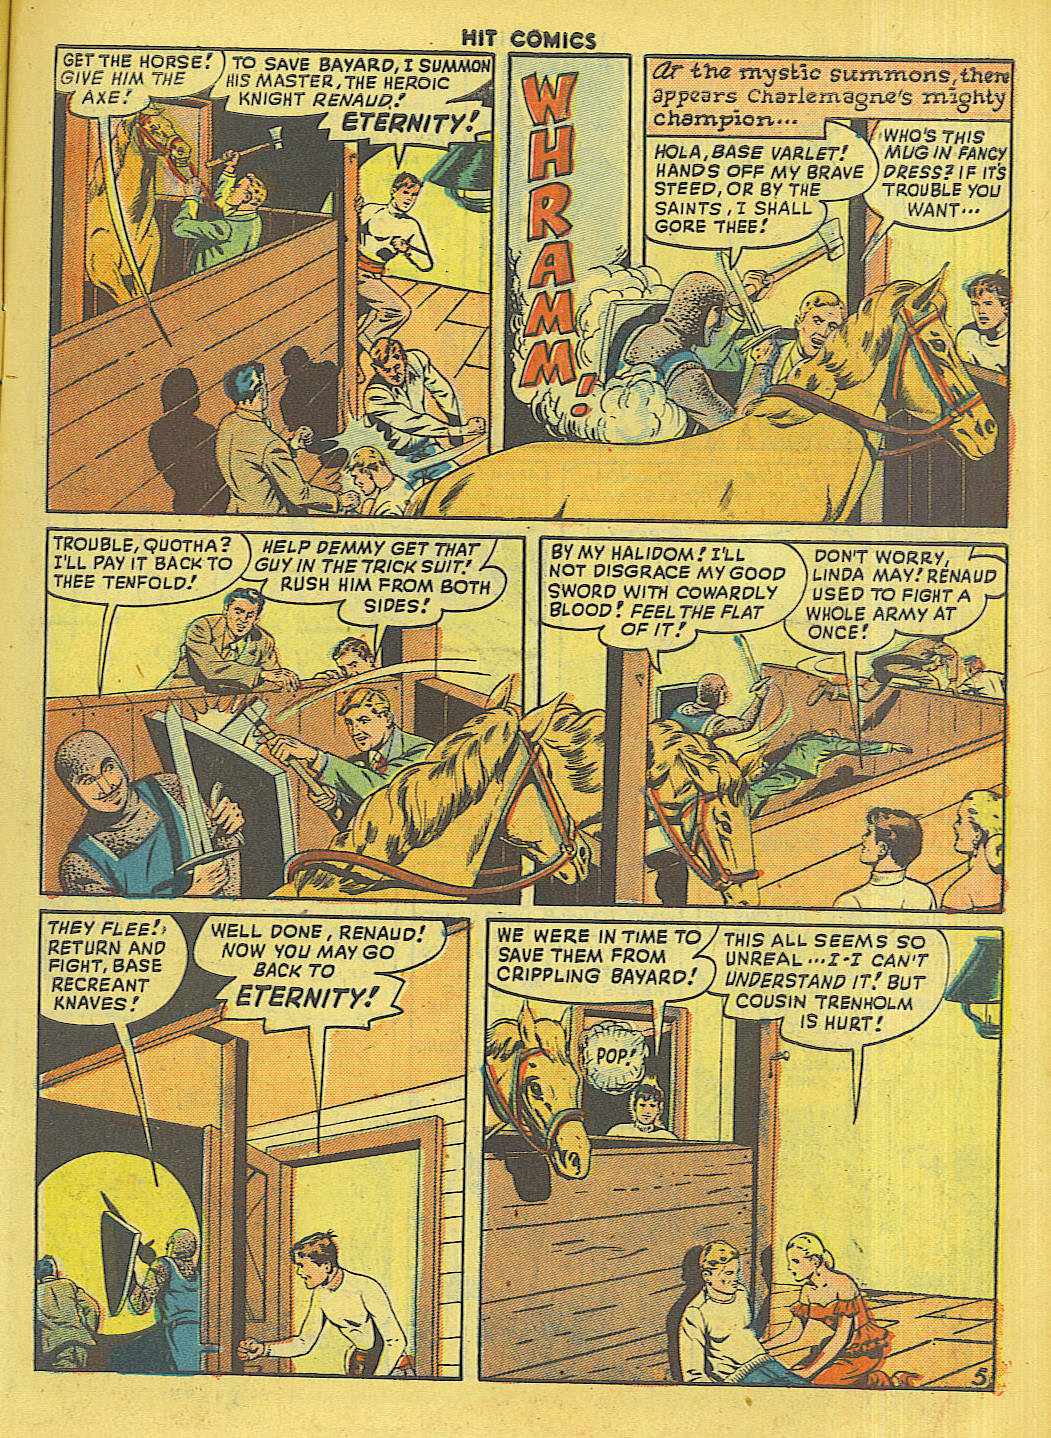 Read online Hit Comics comic -  Issue #56 - 7